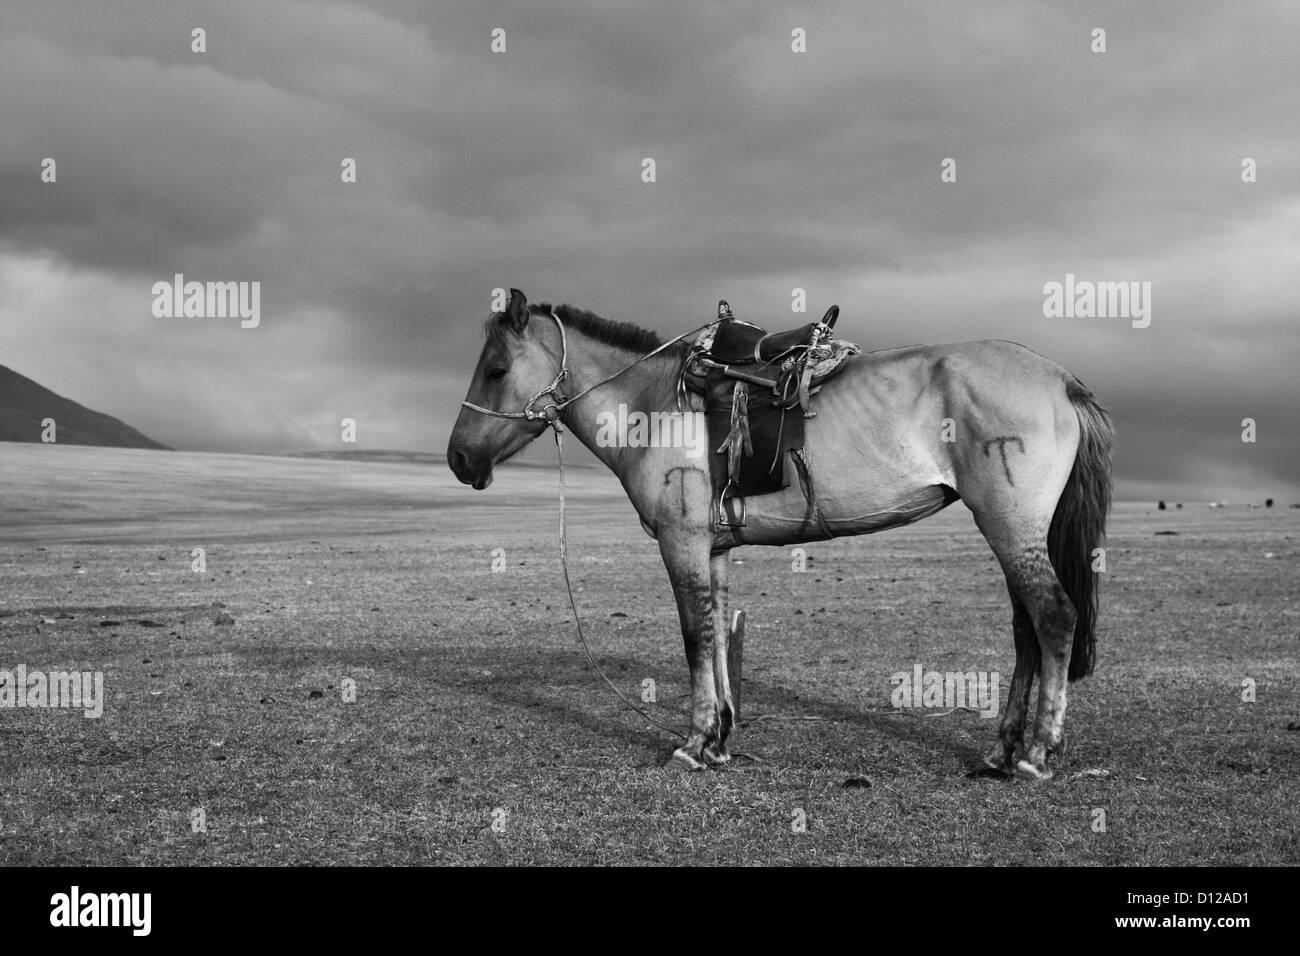 Nomad's horse in Tsambagarav Uul National Park - Stock Image